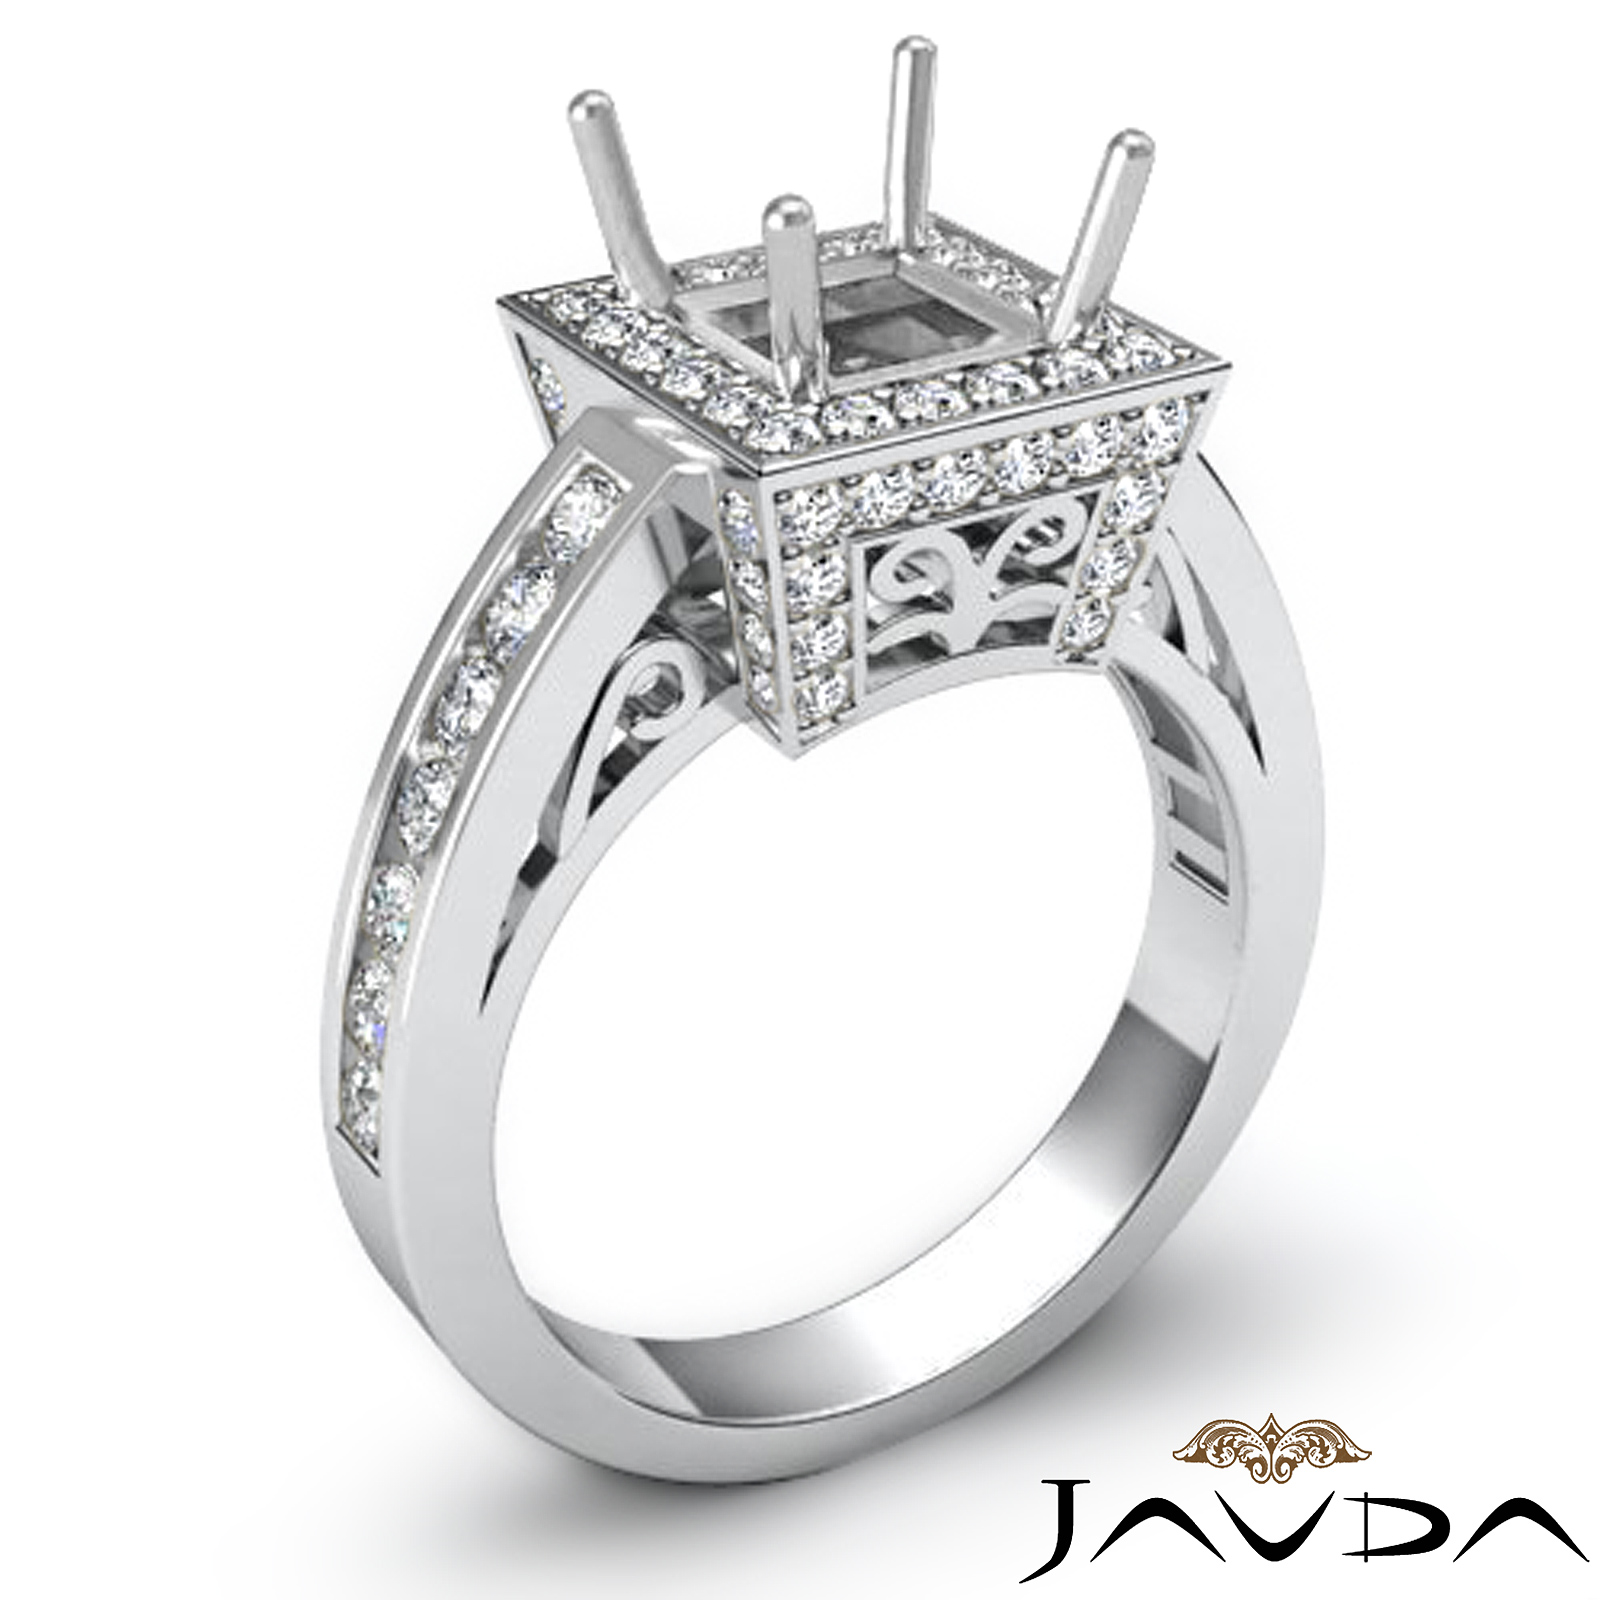 filigree diamond engagement halo pave ring princess cut. Black Bedroom Furniture Sets. Home Design Ideas